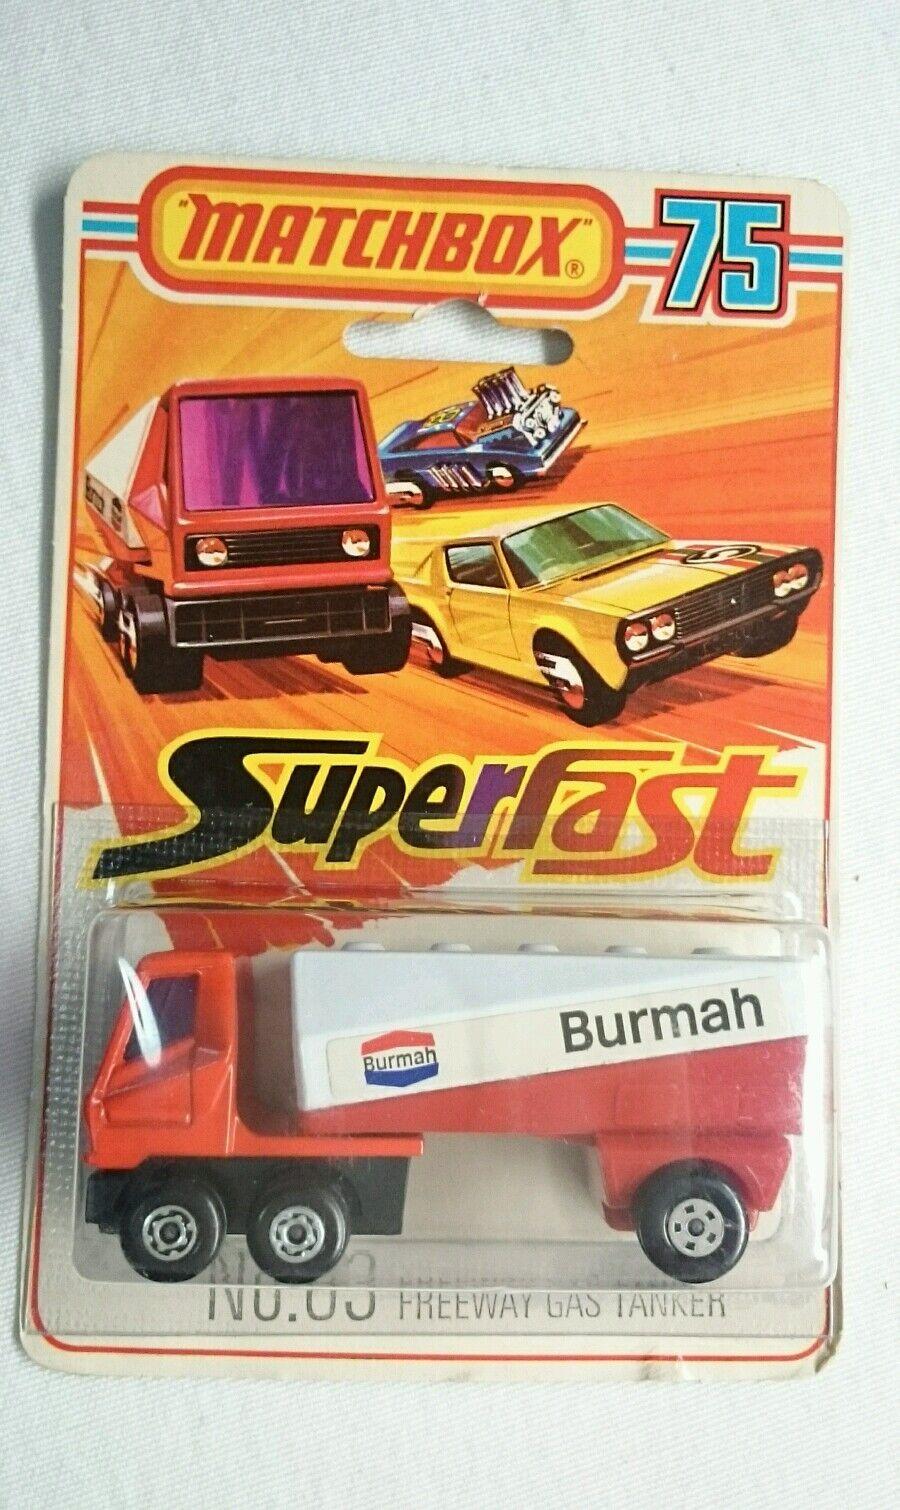 Matchbox Superfast Nº 63 Freeway Gas Tanker Como Nueva 1976 Lesney Vintage